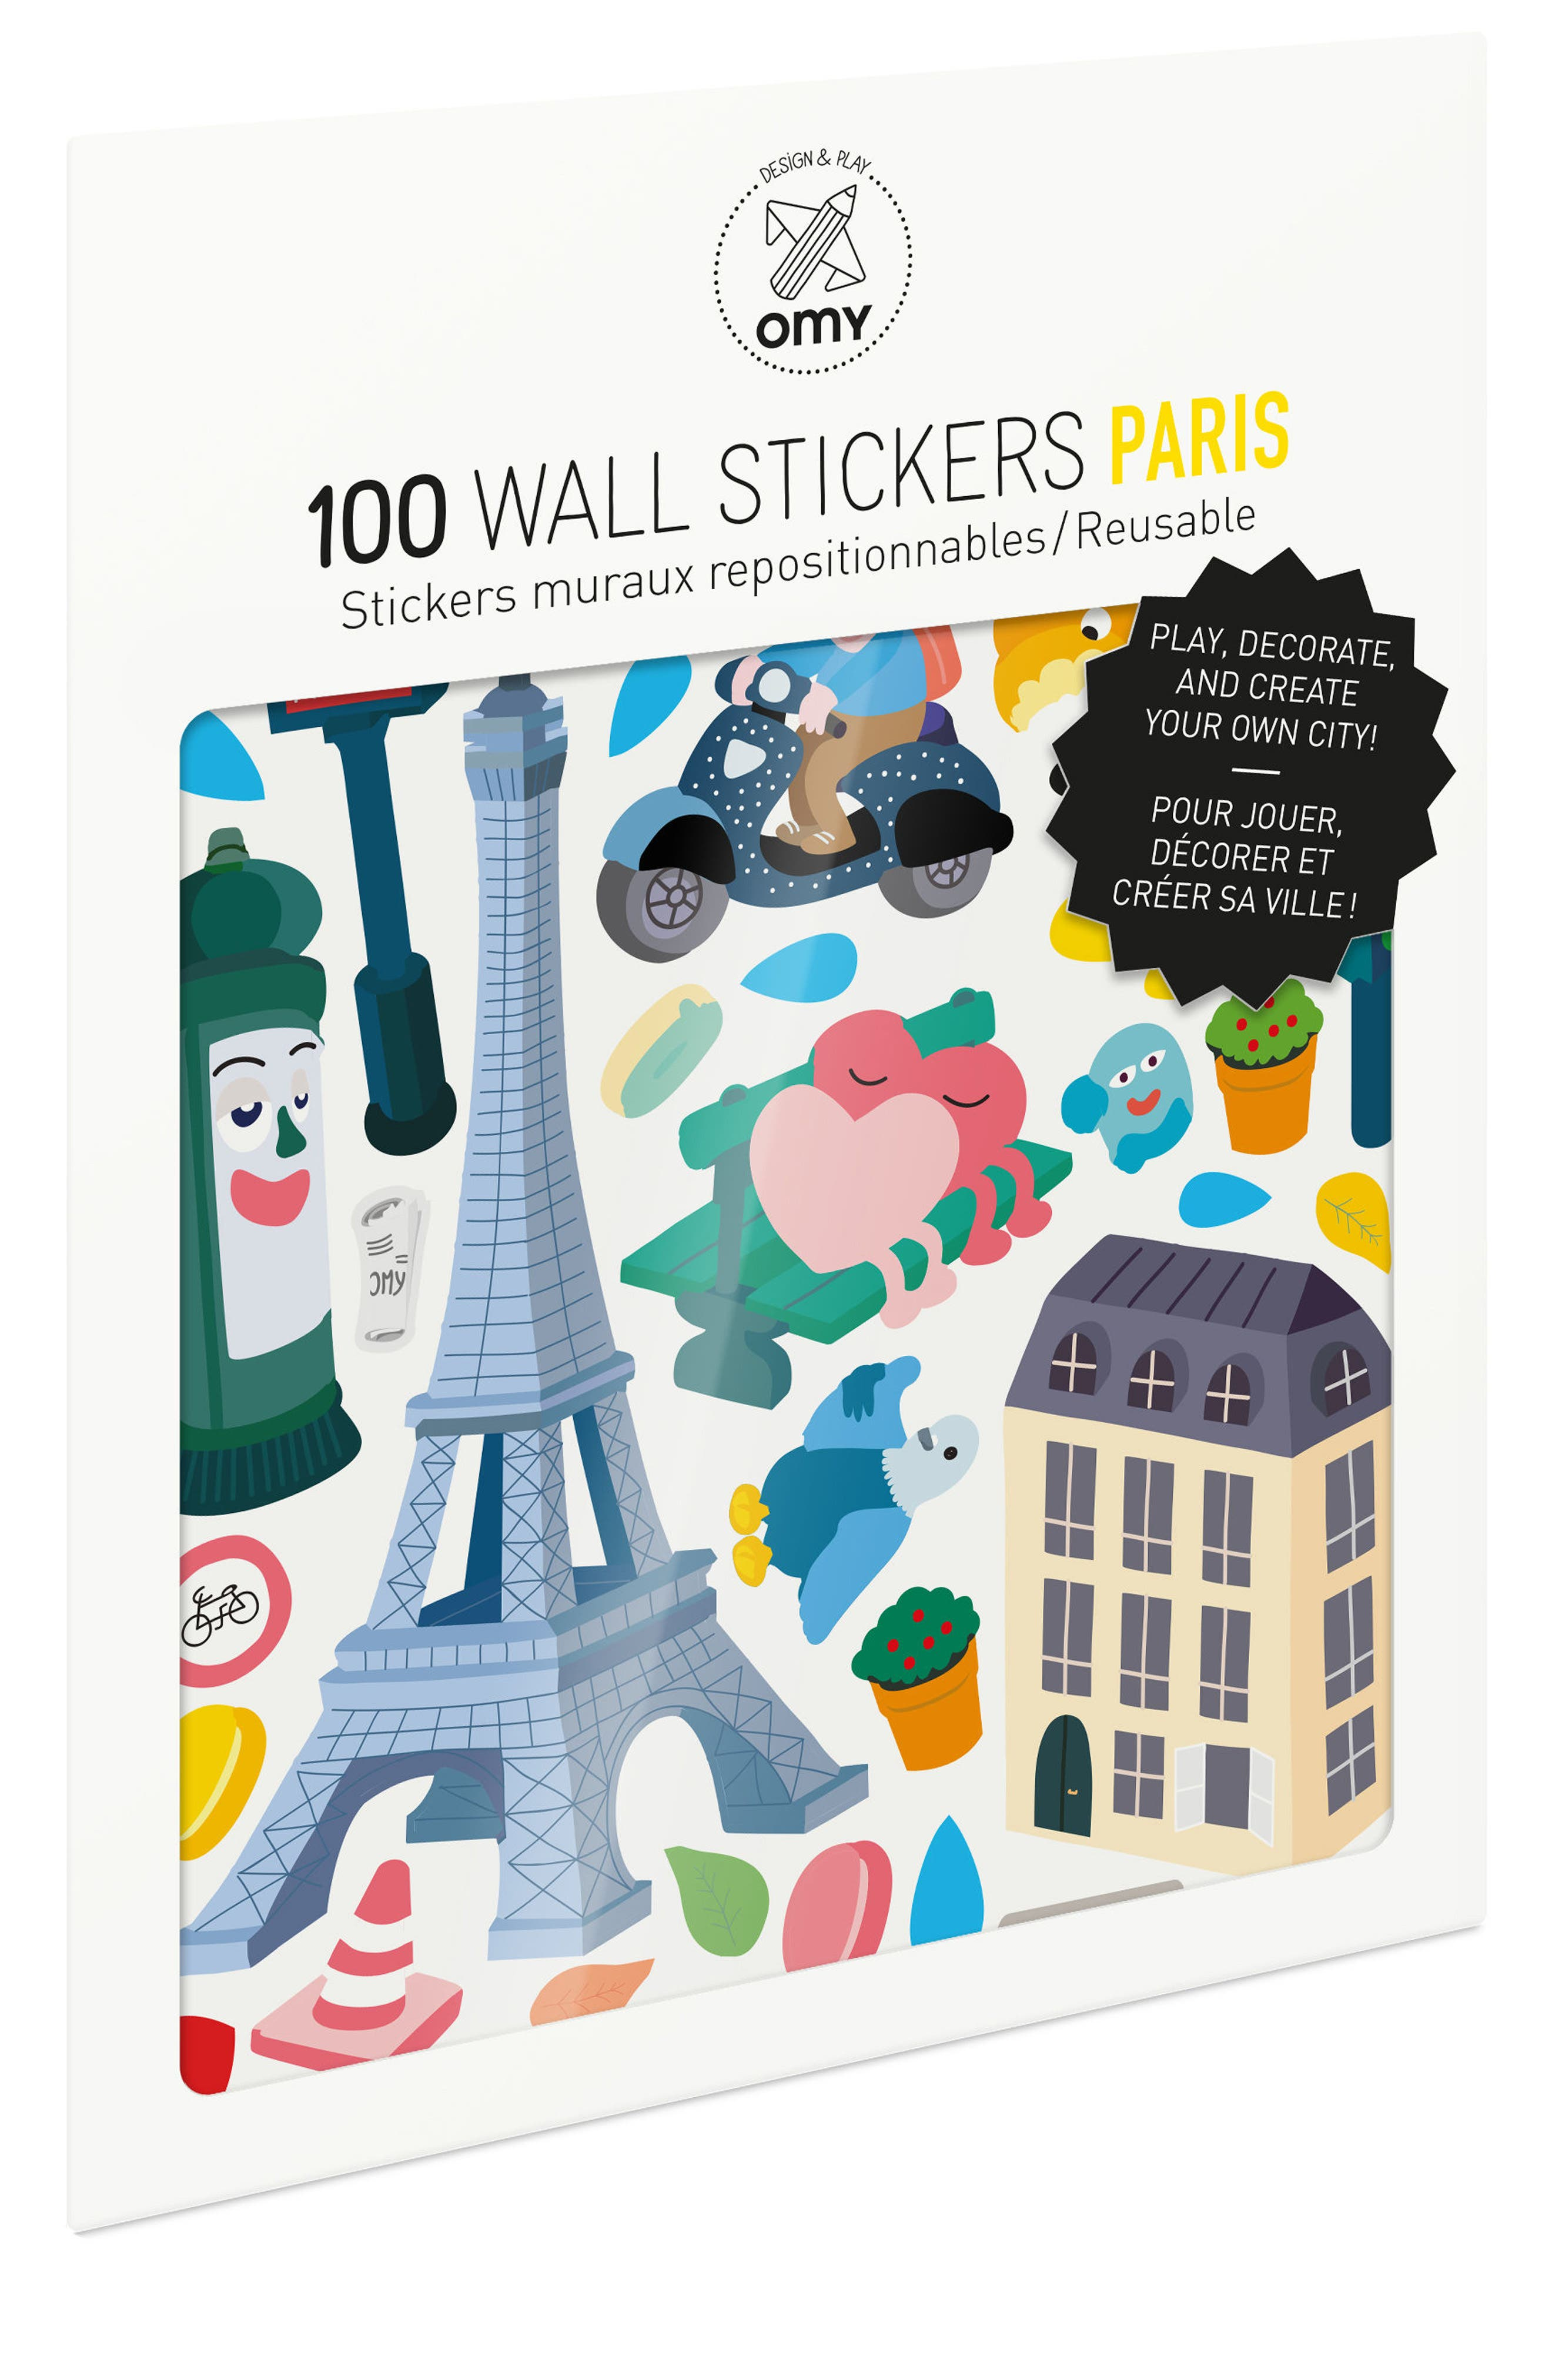 Set of 100 Paris Reusable Wall Stickers,                             Main thumbnail 1, color,                             100